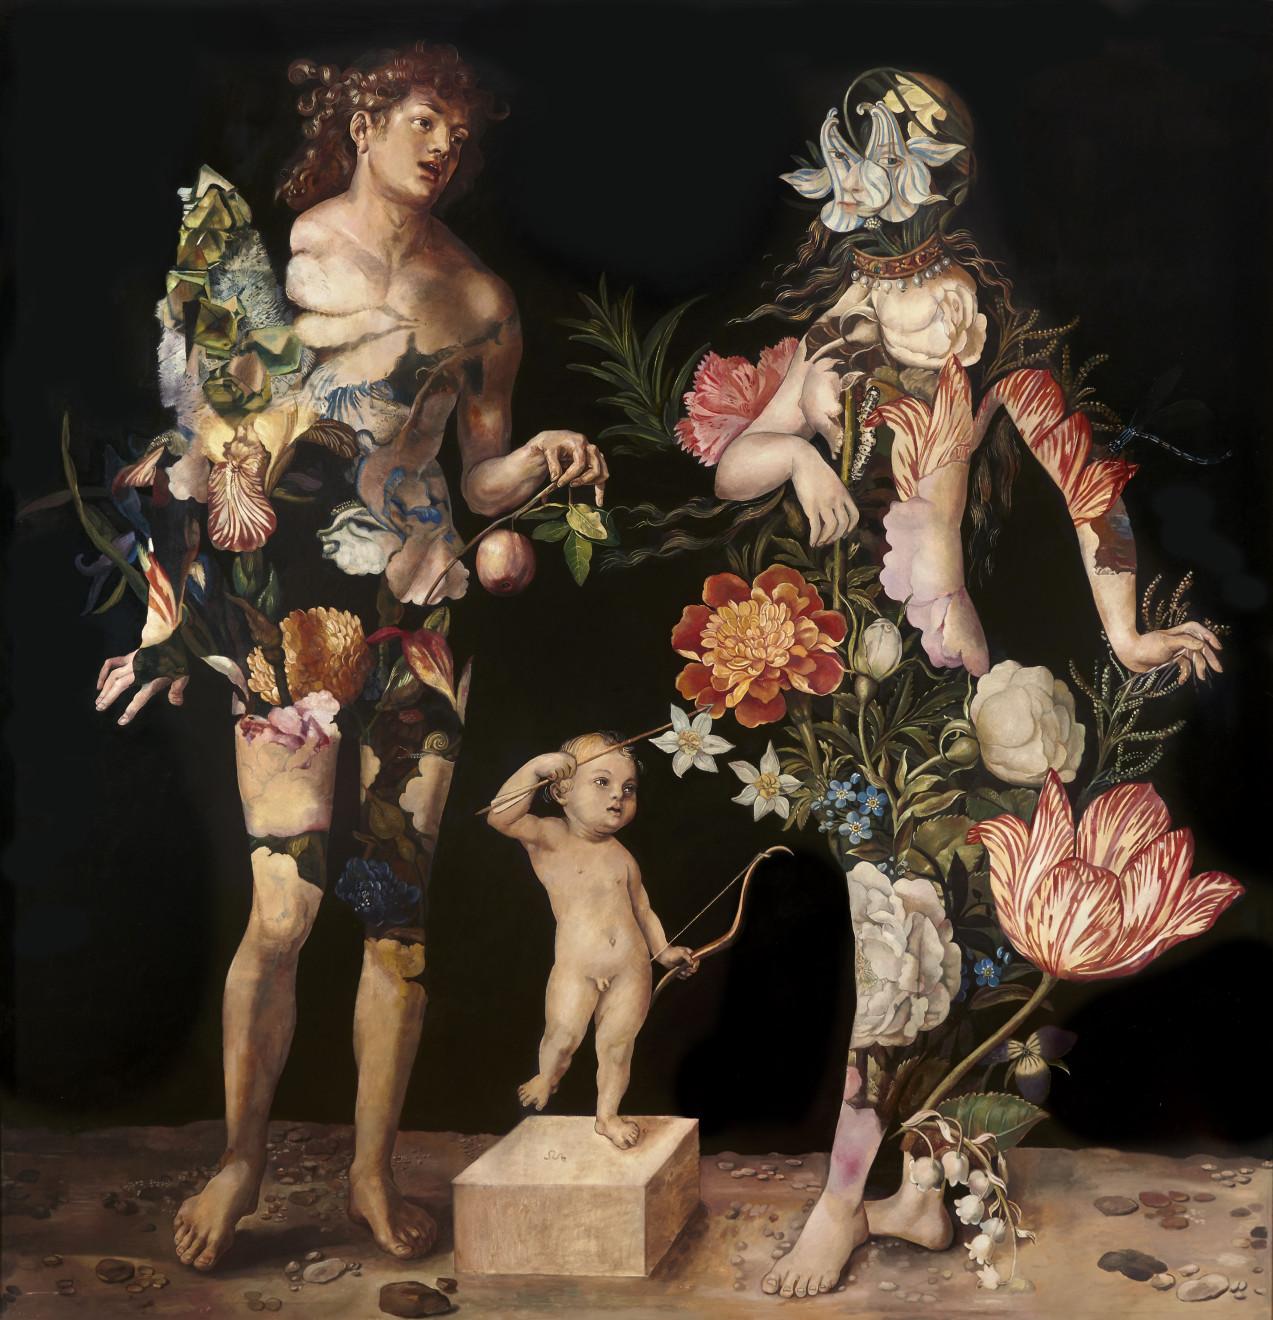 Wolfe von Lenkiewicz, Adam and Eve, 2019